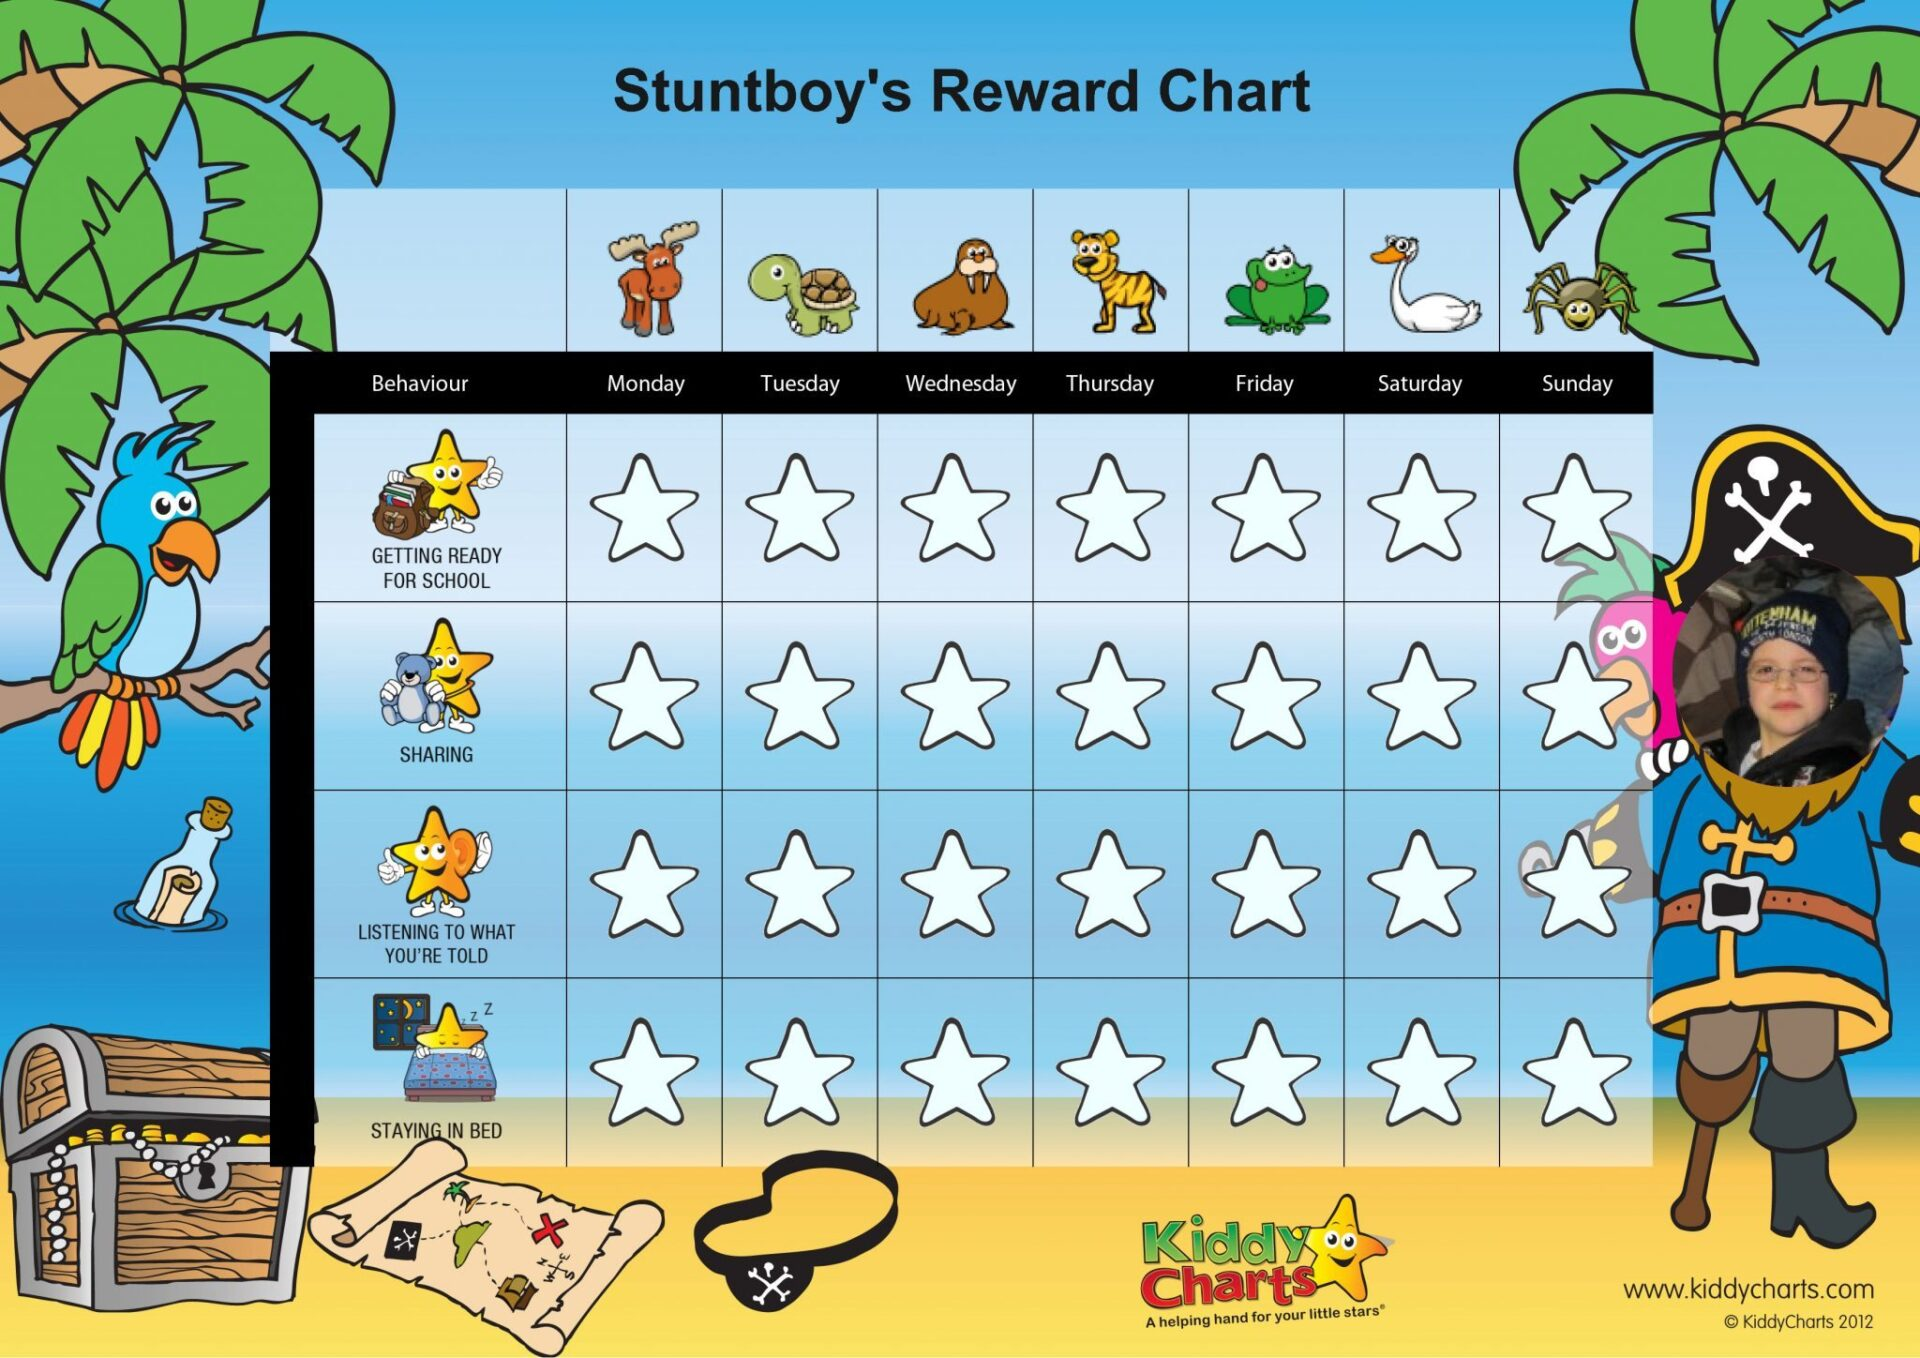 A reward for those good grades 2